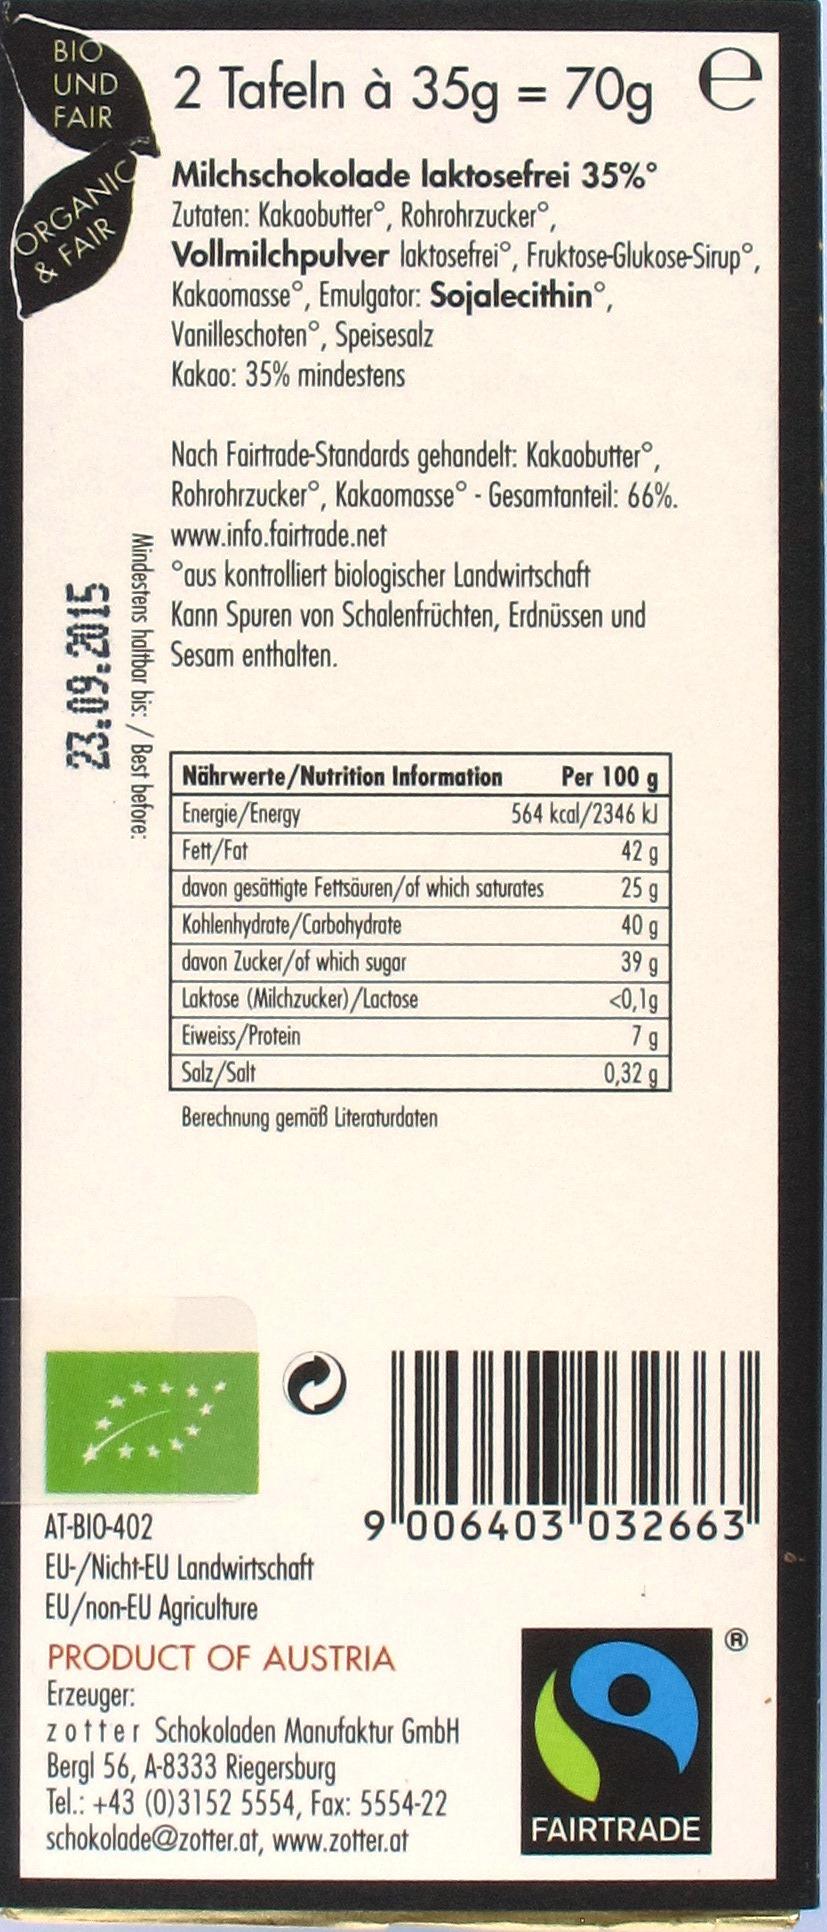 Inhaltsangaben: Zotter Labooko 35% Laktosefrei